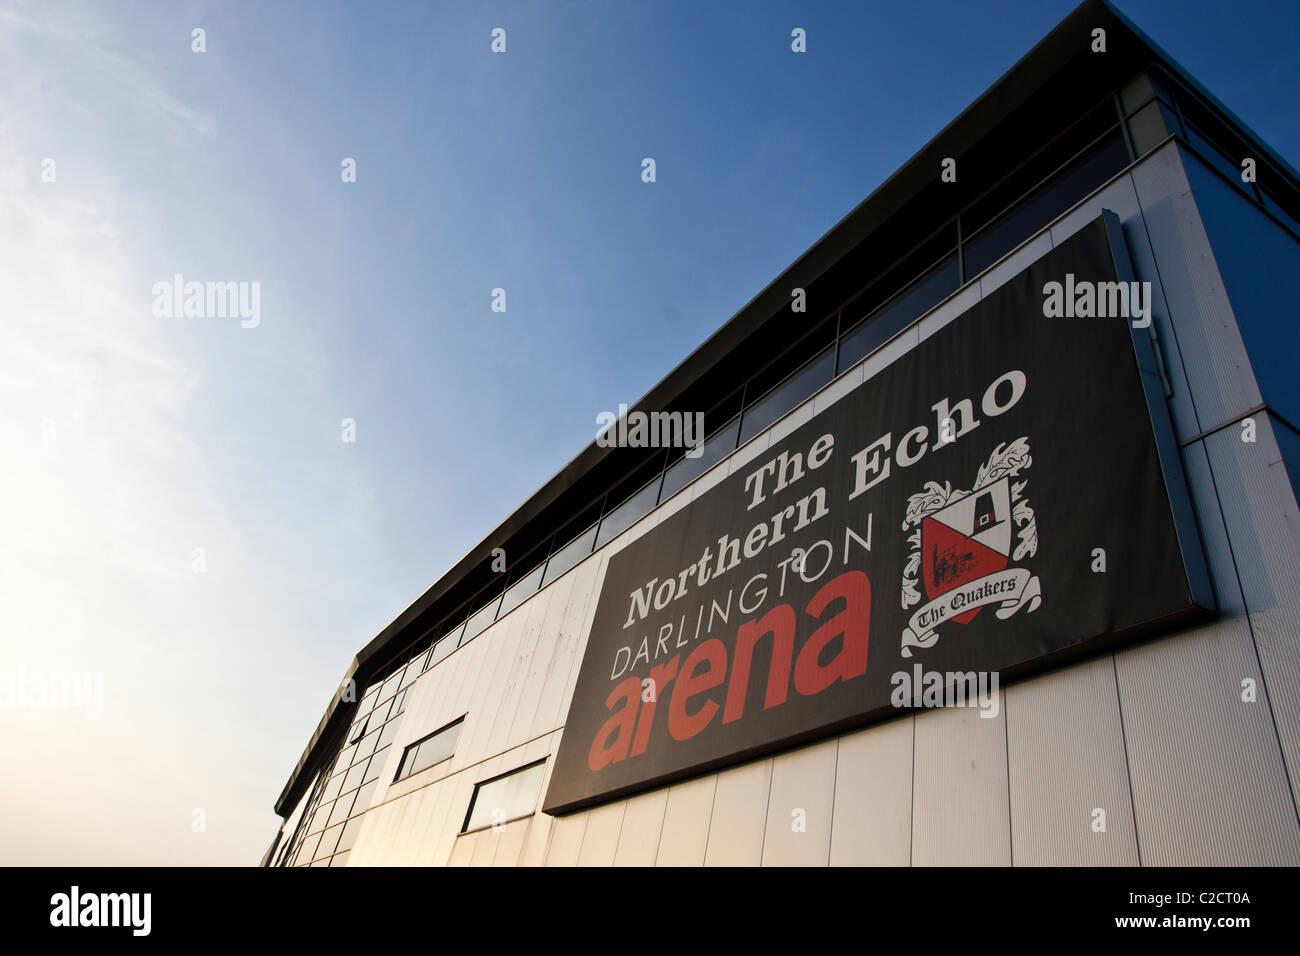 The Northern Echo Darlington Arena, home of Darlington Football Club. - Stock Image